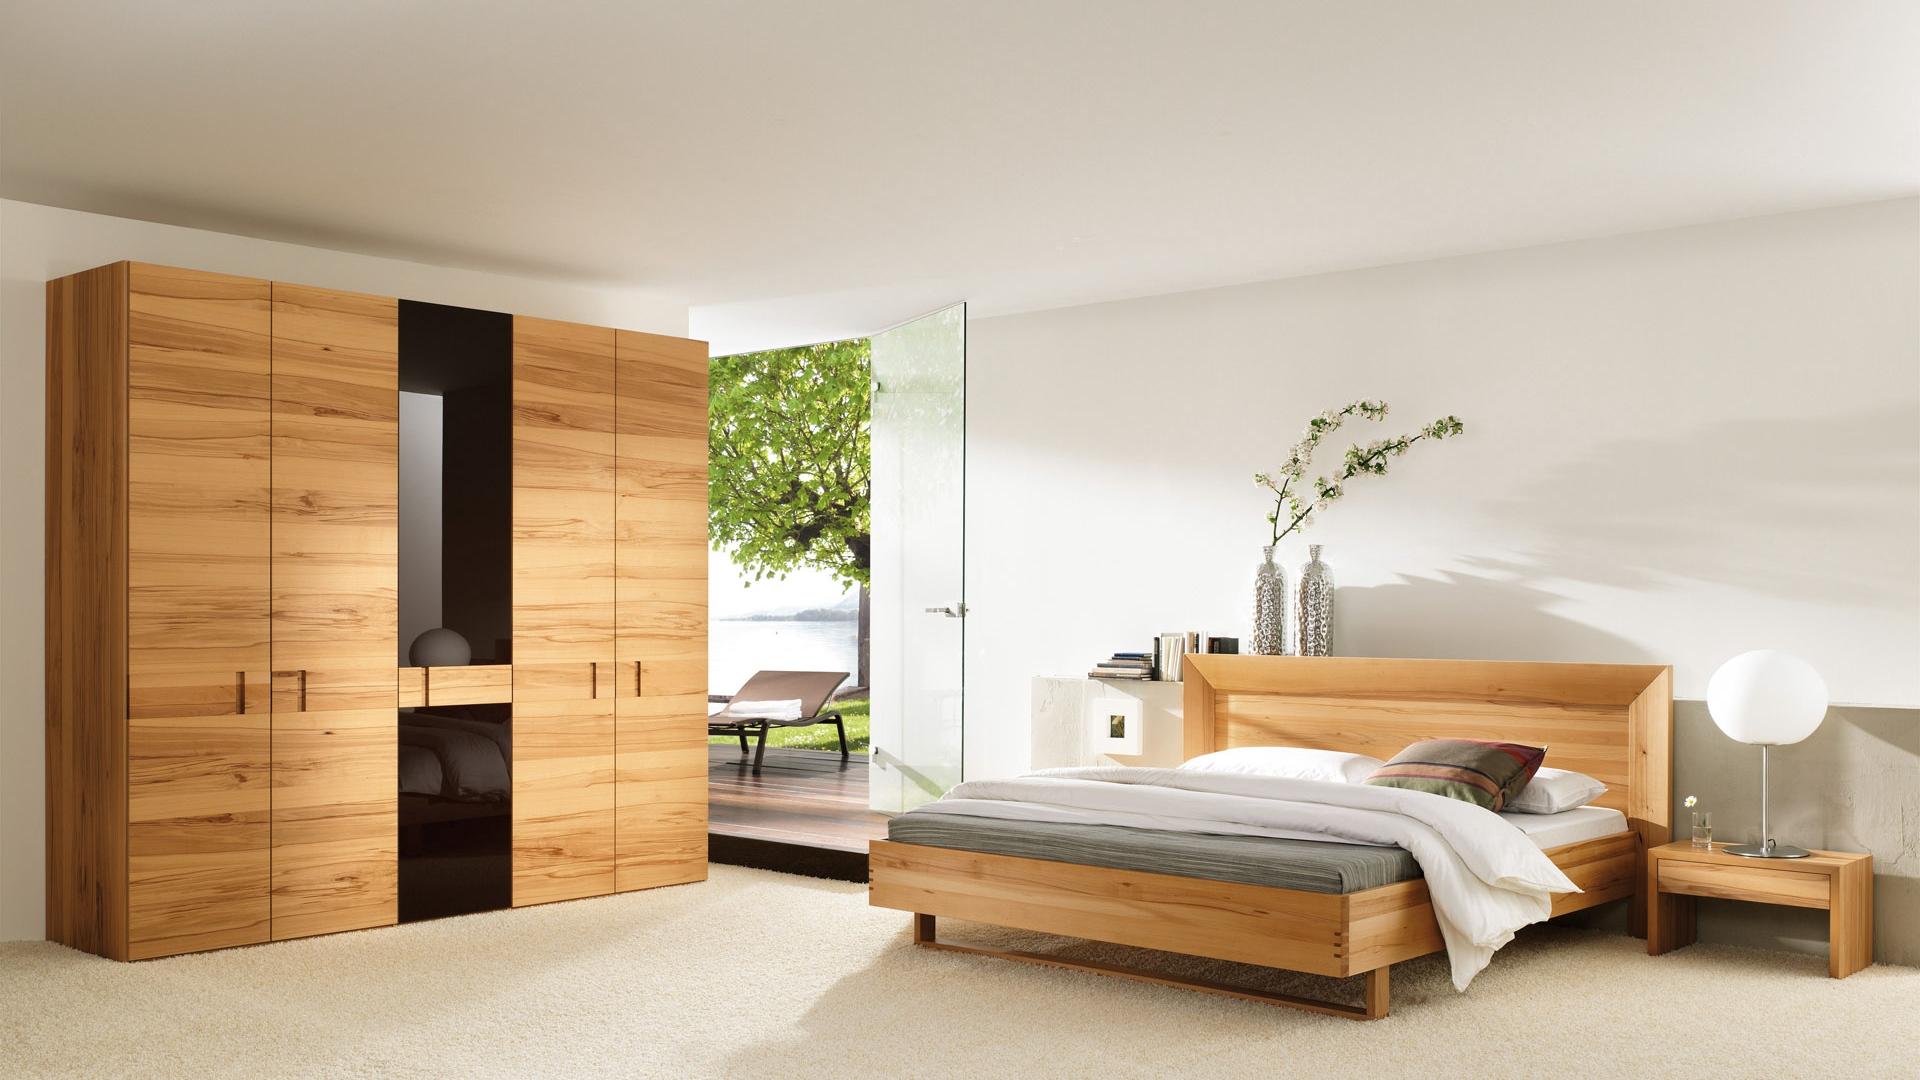 Download wallpaper 1920x1080 bedroom wardrobe style wooden full 1920x1080